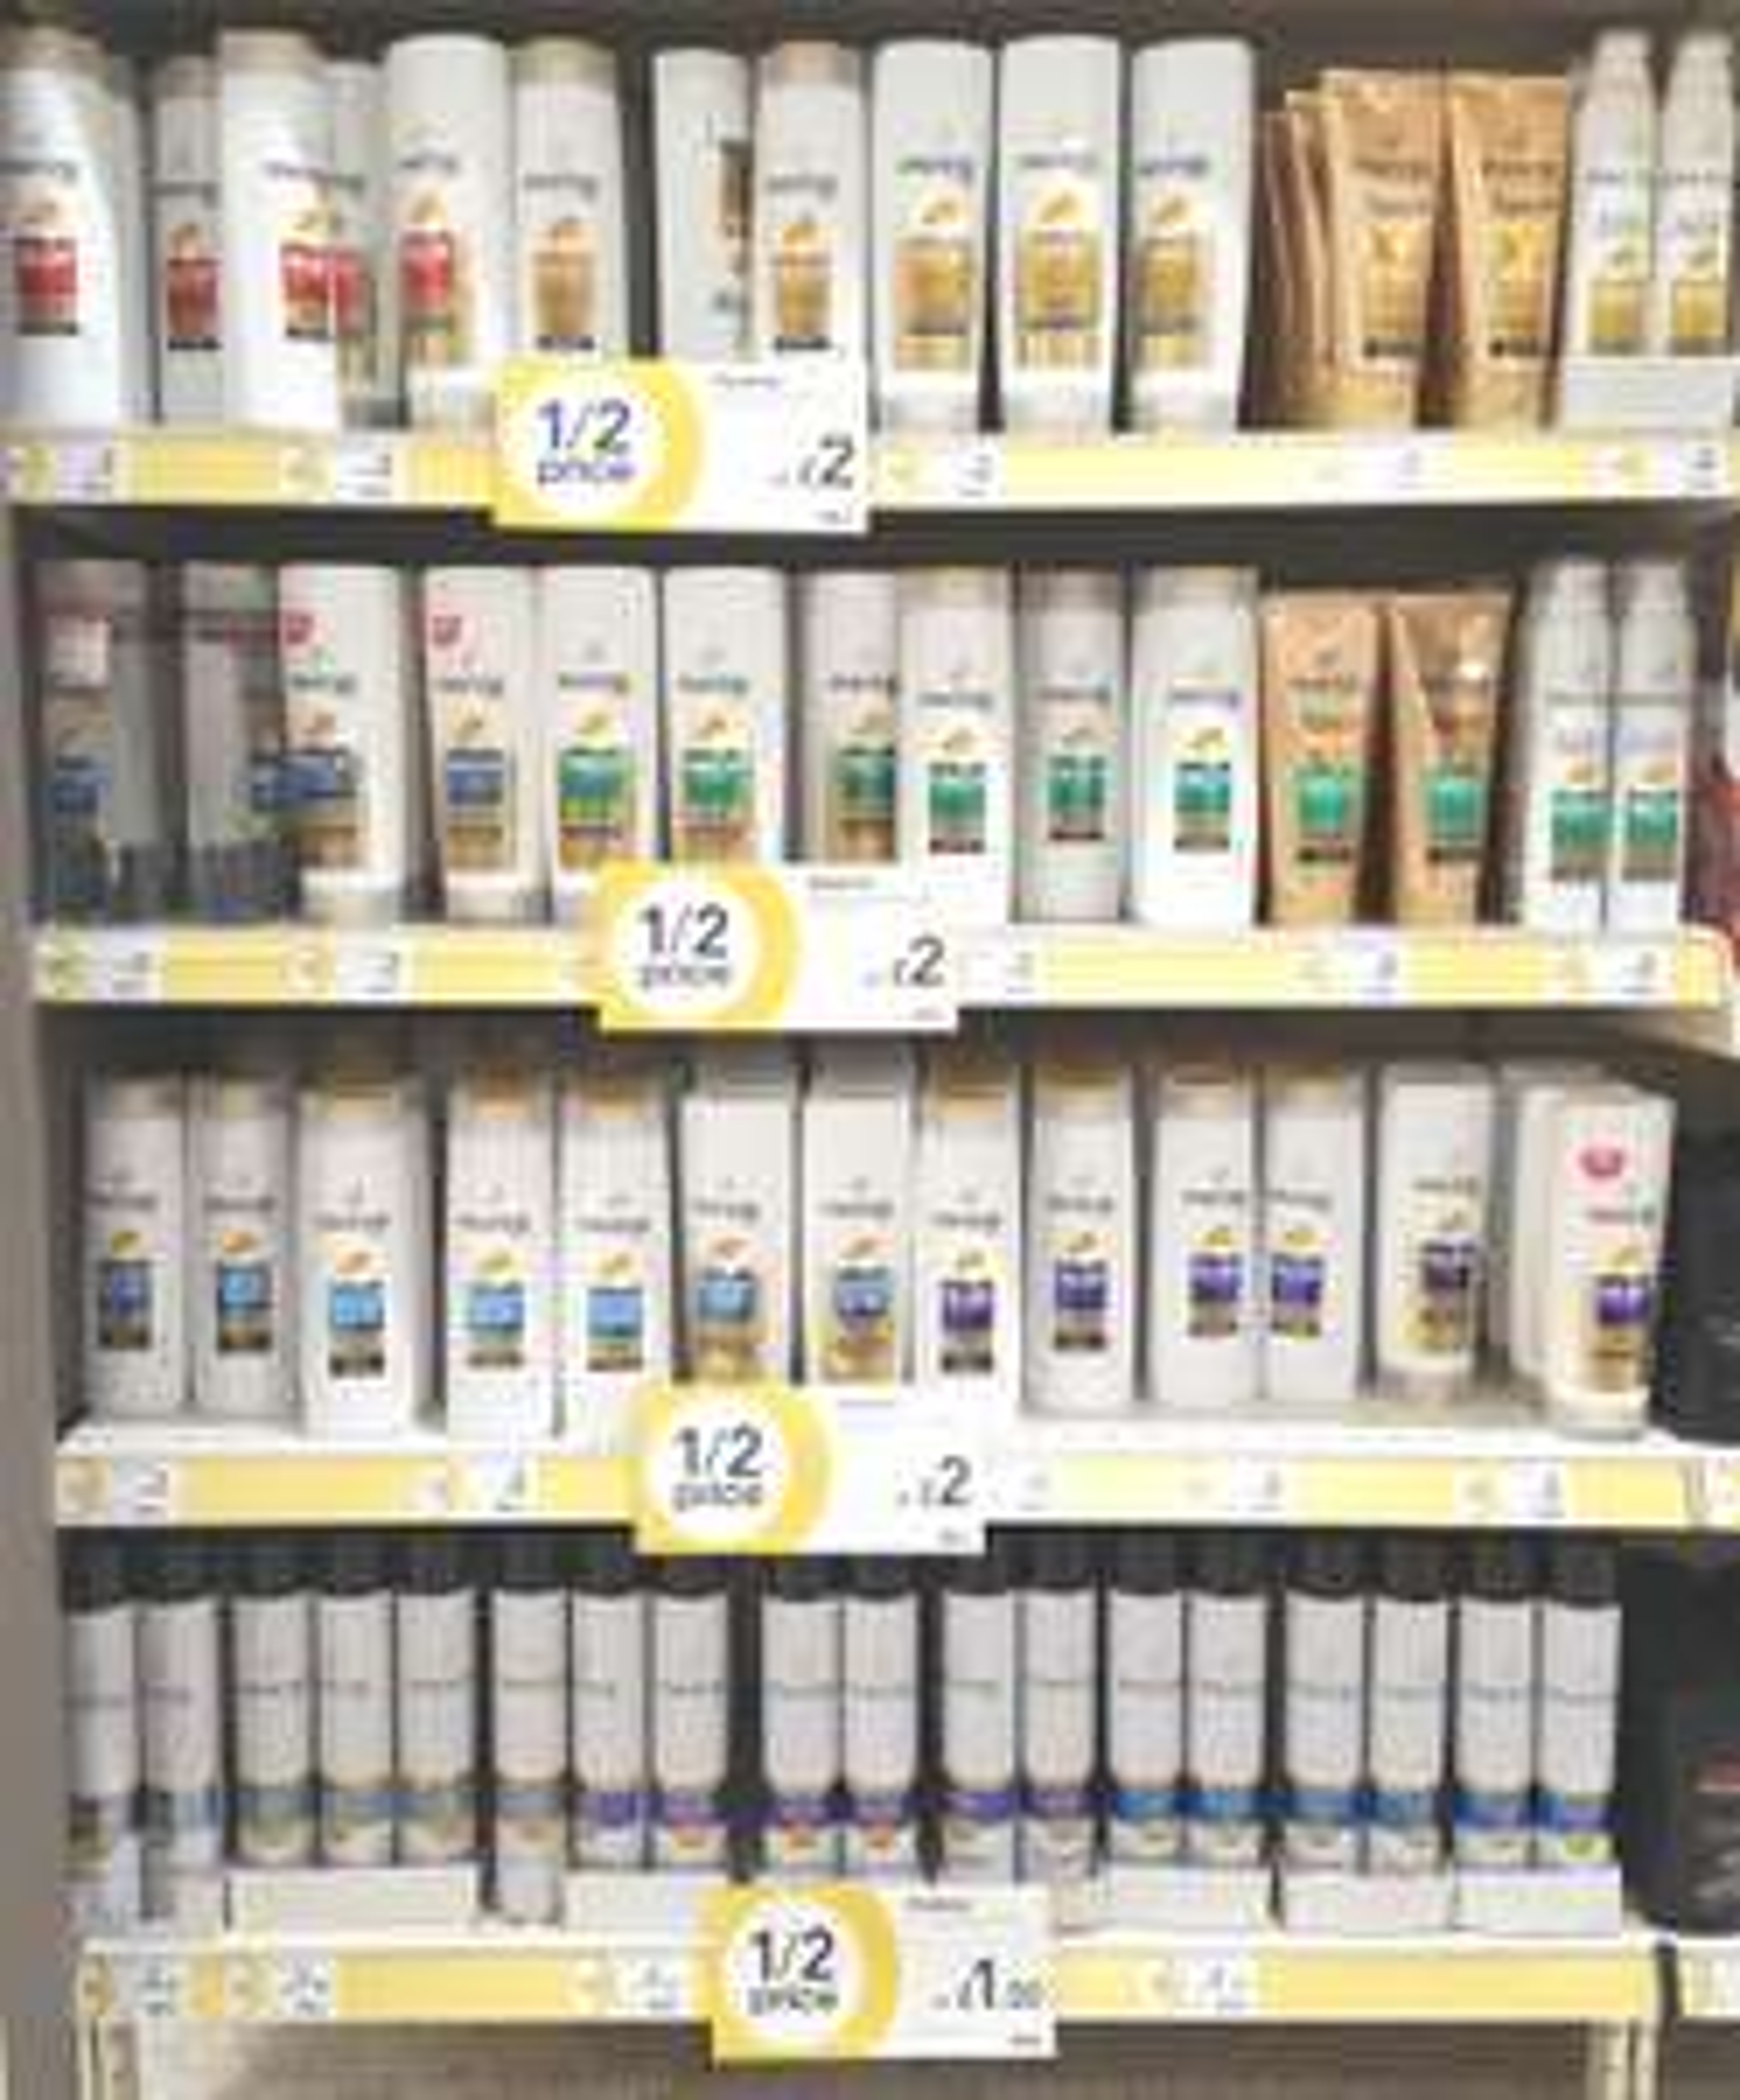 HALF PRICE 400ml Pantene Shampoos, Conditioners, 2-in-1's in Wilko @ Sittingbourne